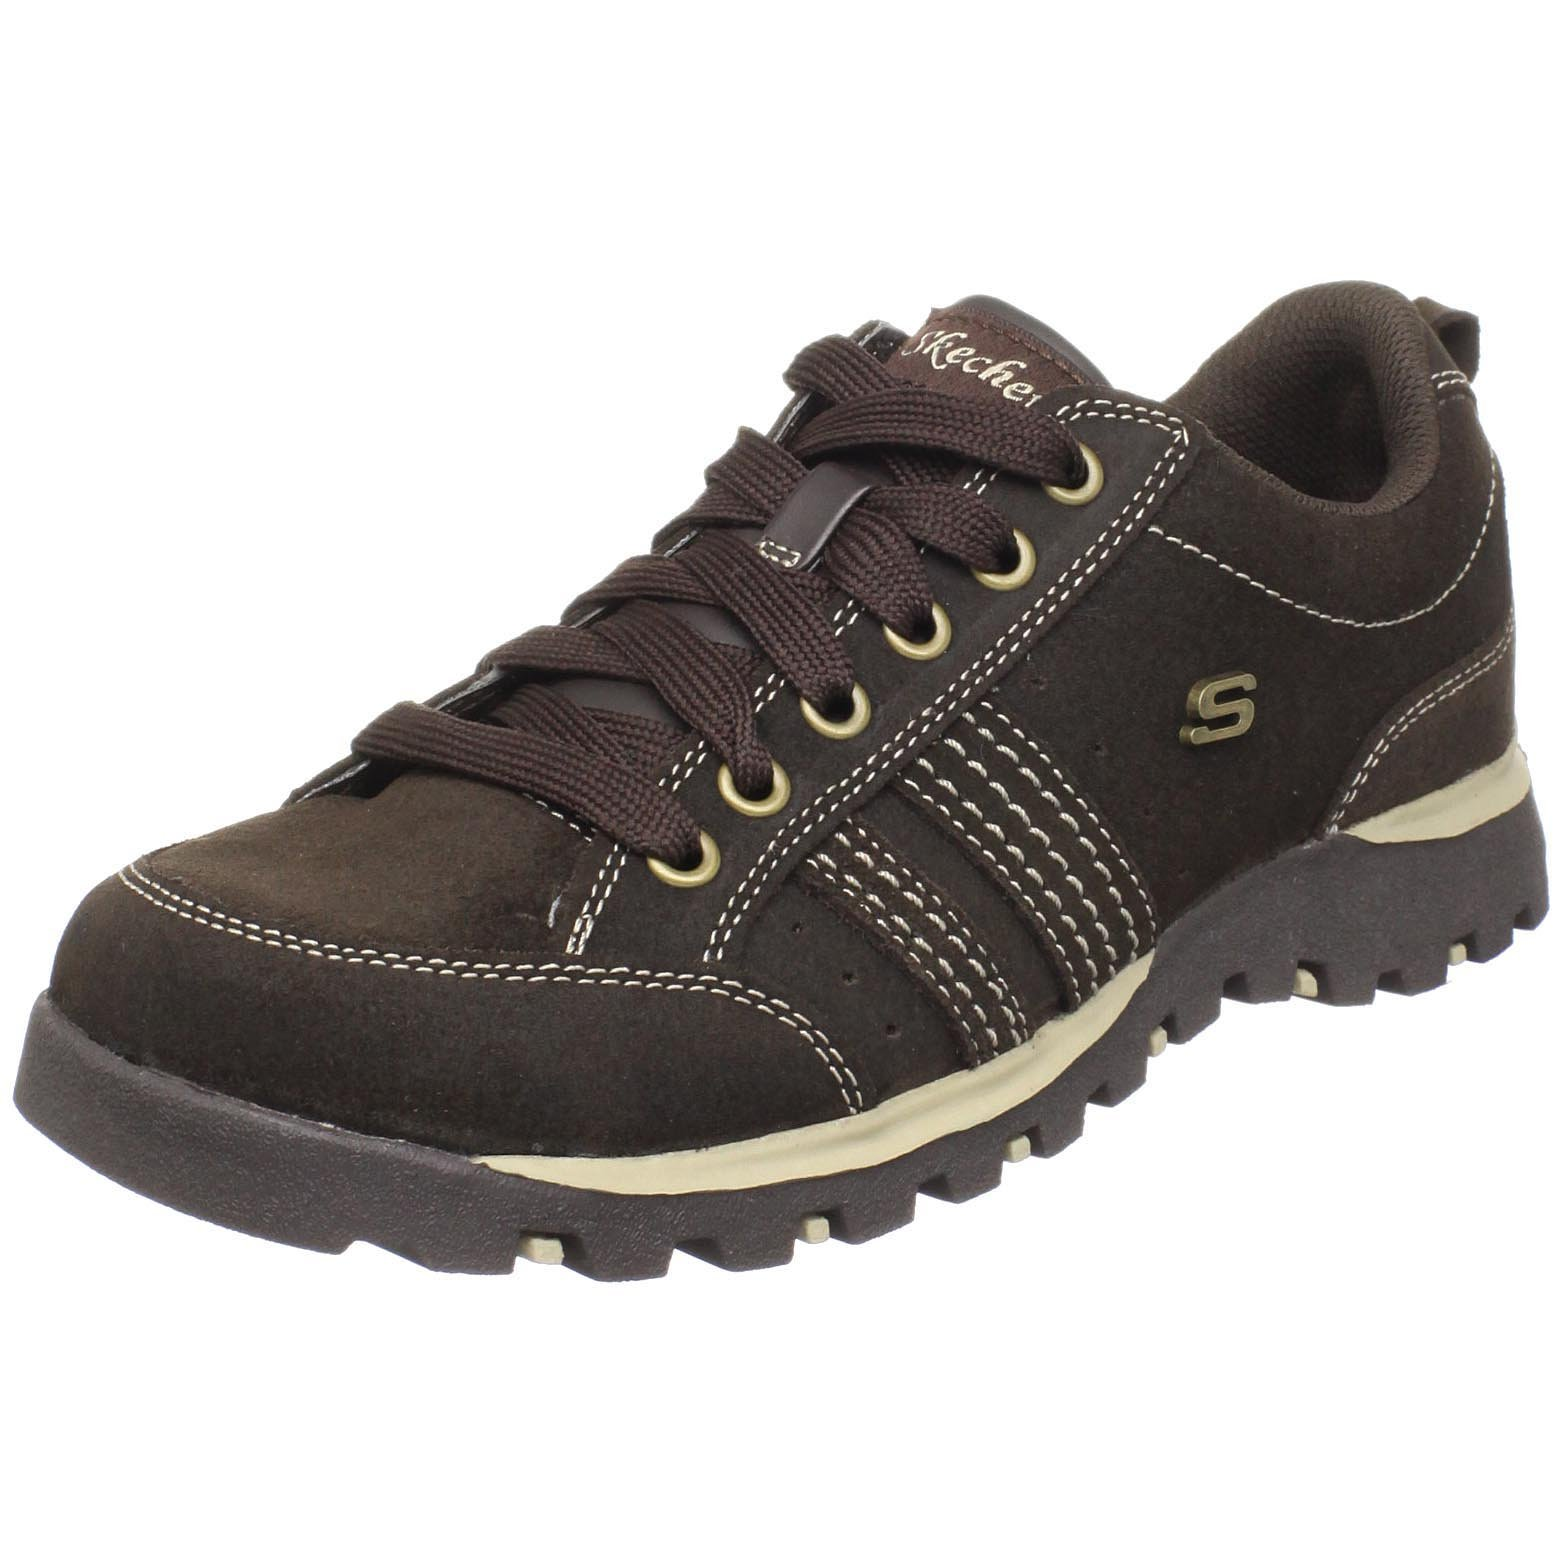 Skechers Women's Grand Jams-Replenish Sneaker,Chocolate Suede,11 M US